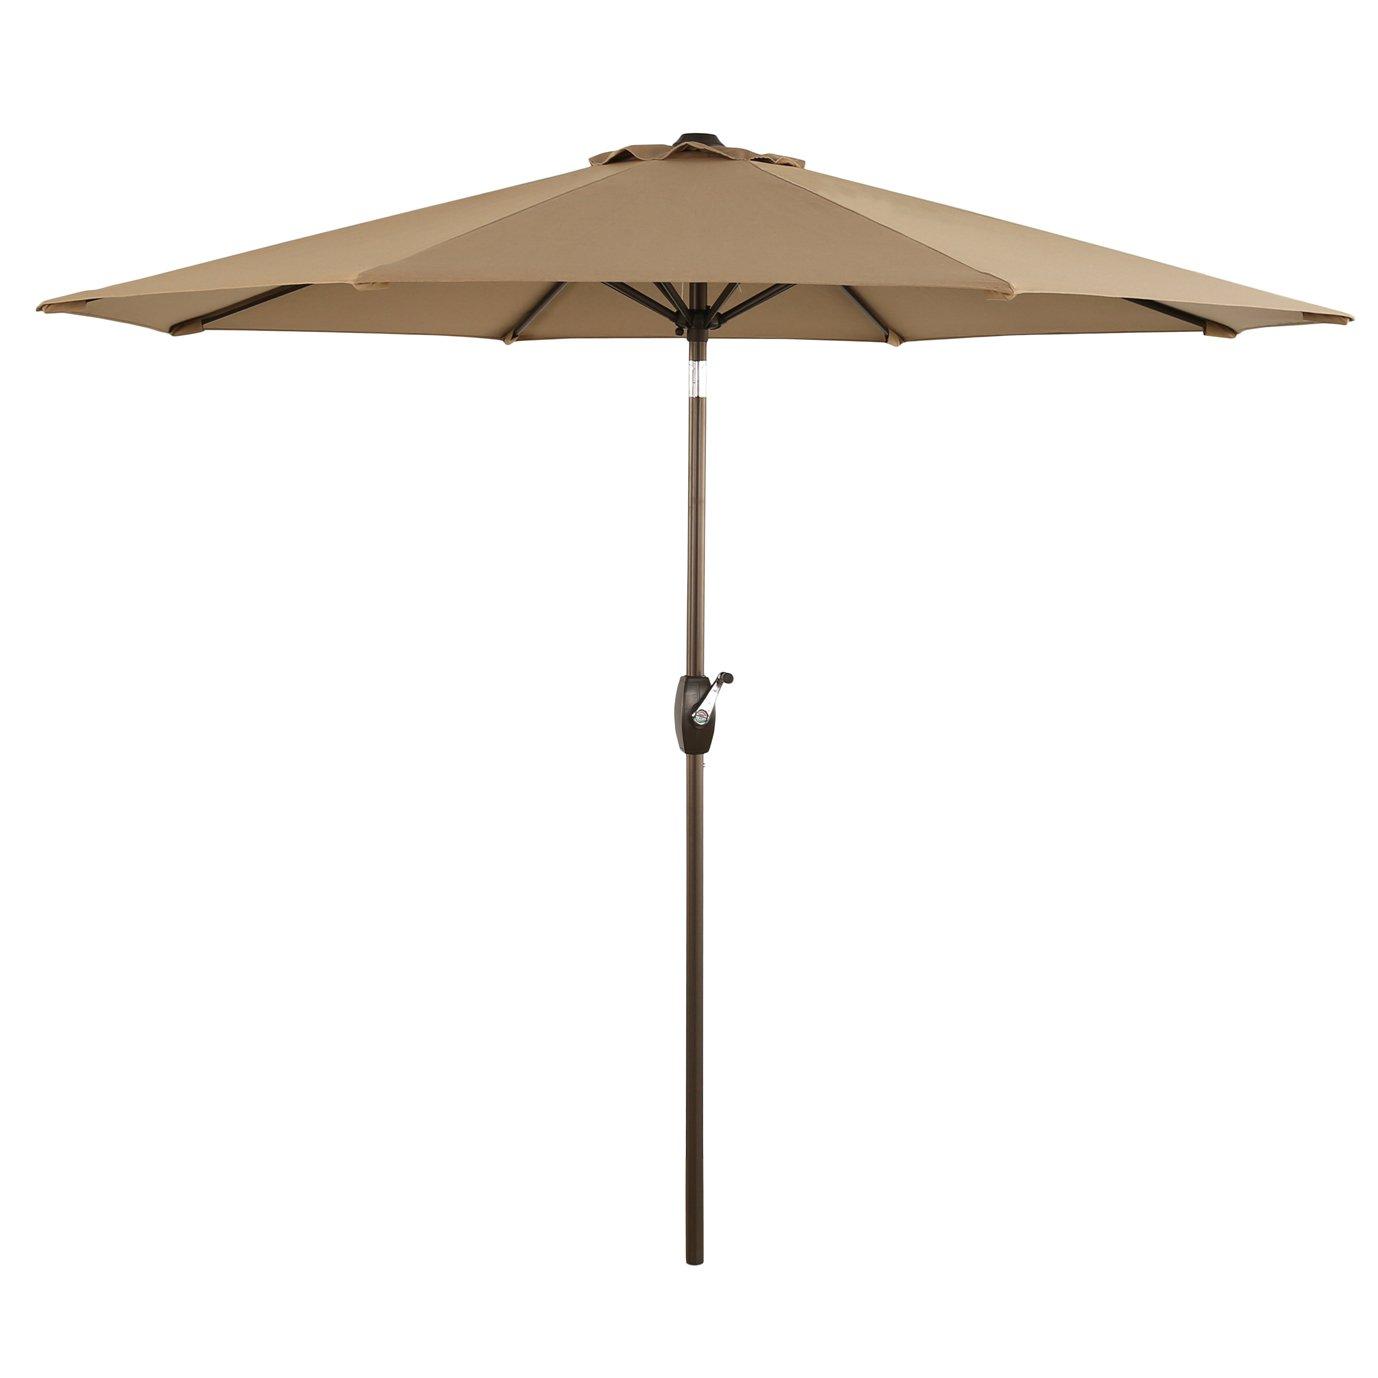 Ulax Furniture 9 Ft Outdoor Umbrella Patio Market Umbrella Aluminum with Push Button Tilt Crank, Sunbrella Fabric, Heather Beige